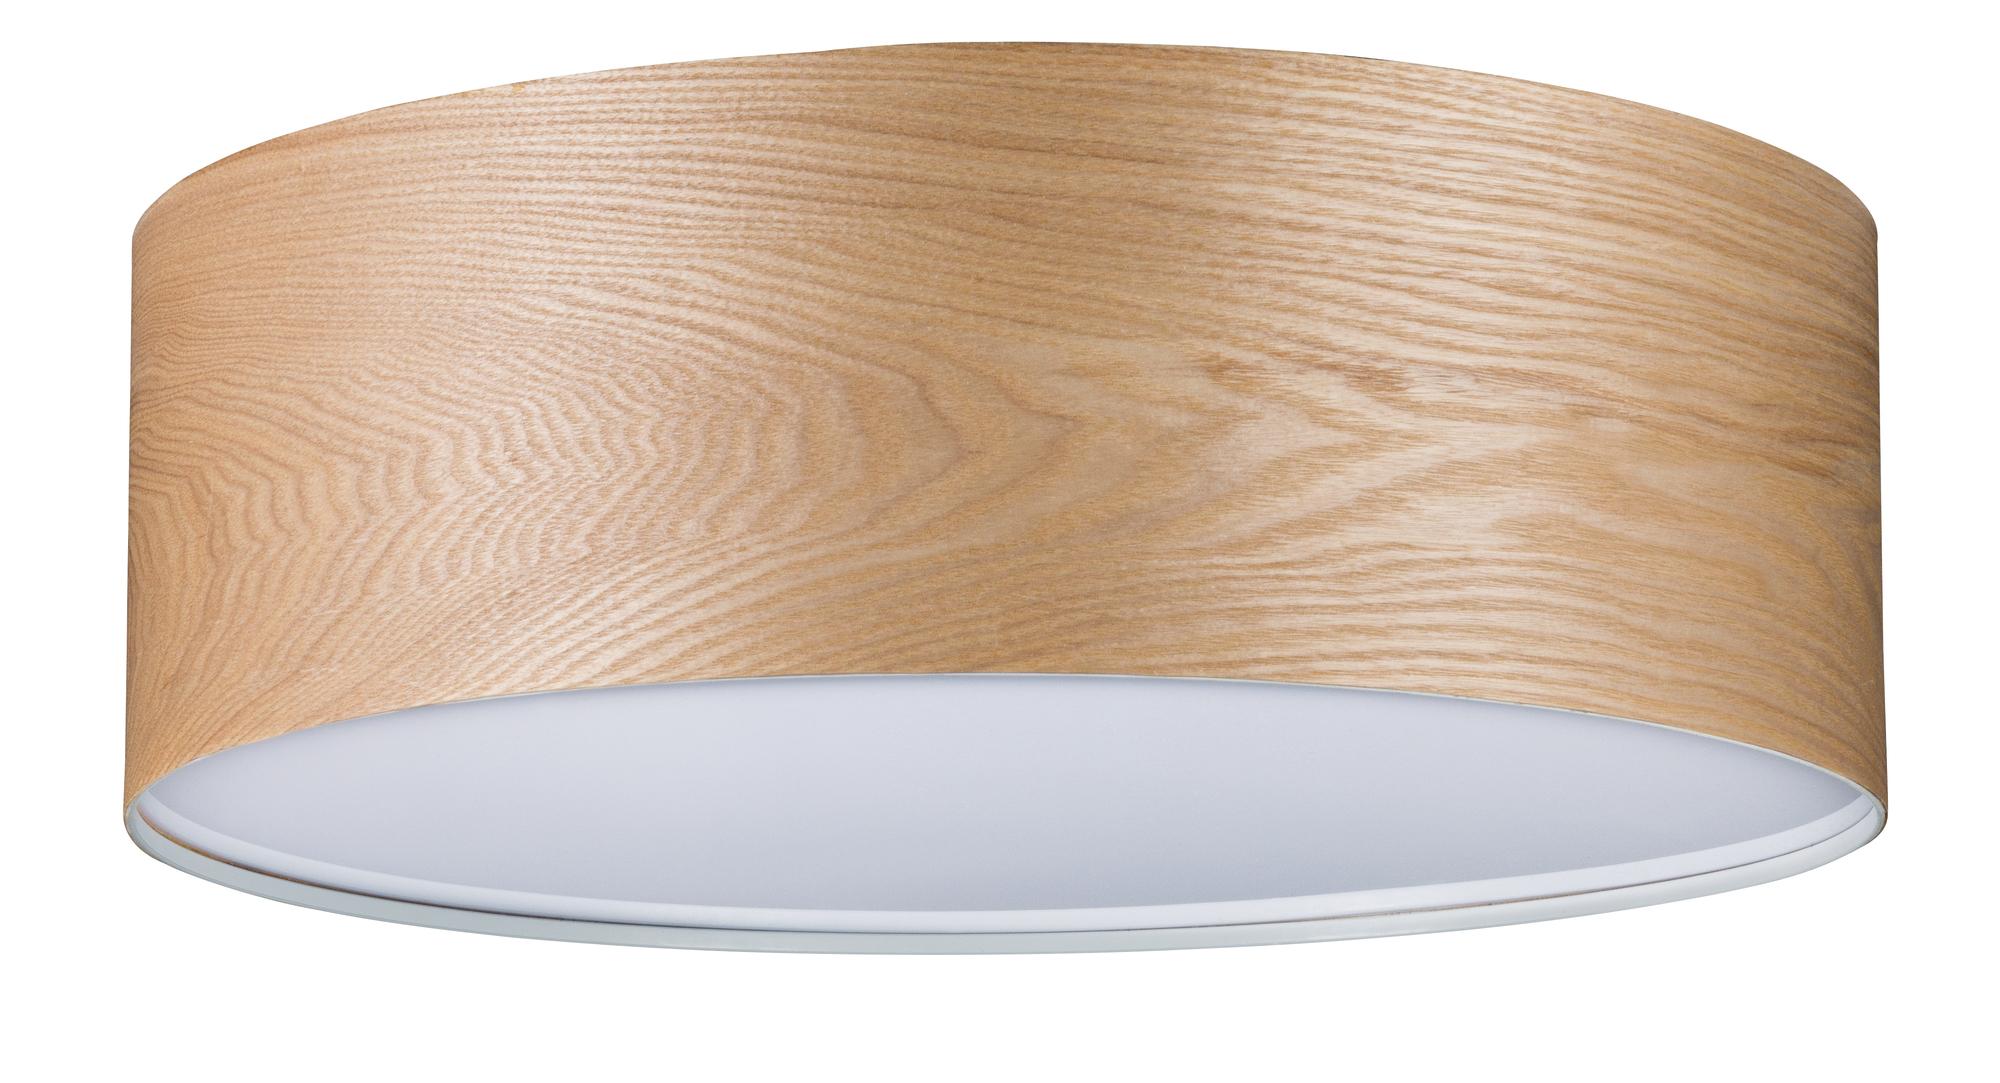 deckenleuchte neordic liska 3 flammig ohne leuchtmittel. Black Bedroom Furniture Sets. Home Design Ideas